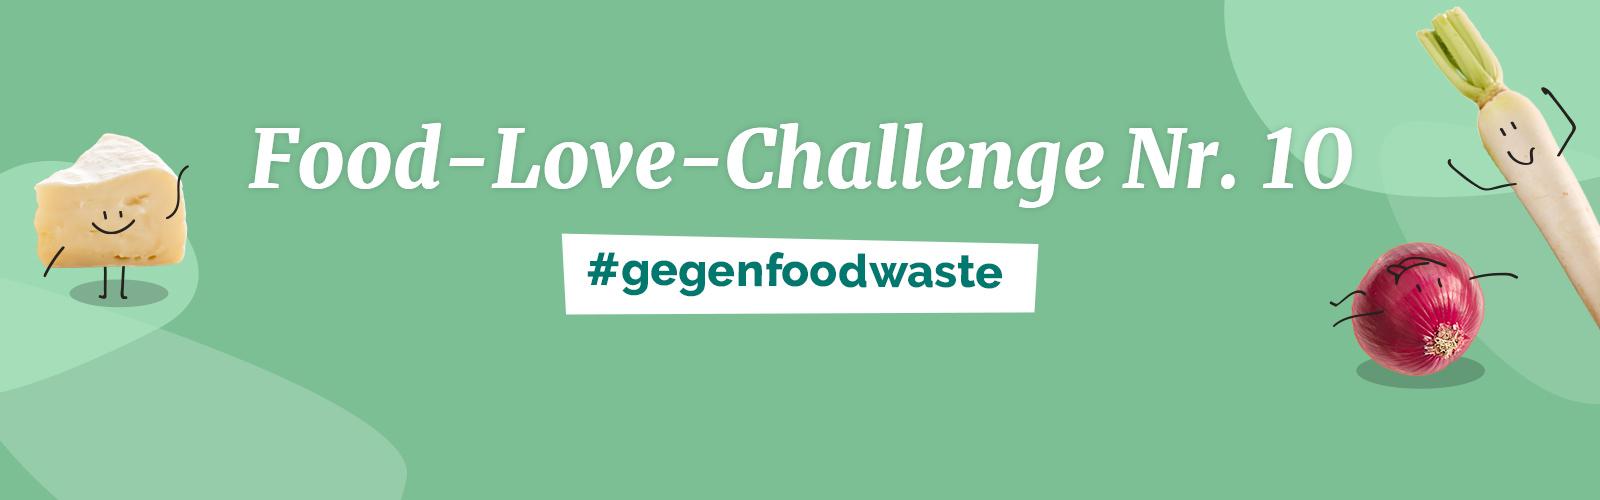 Food Love Challenge Nr. 10